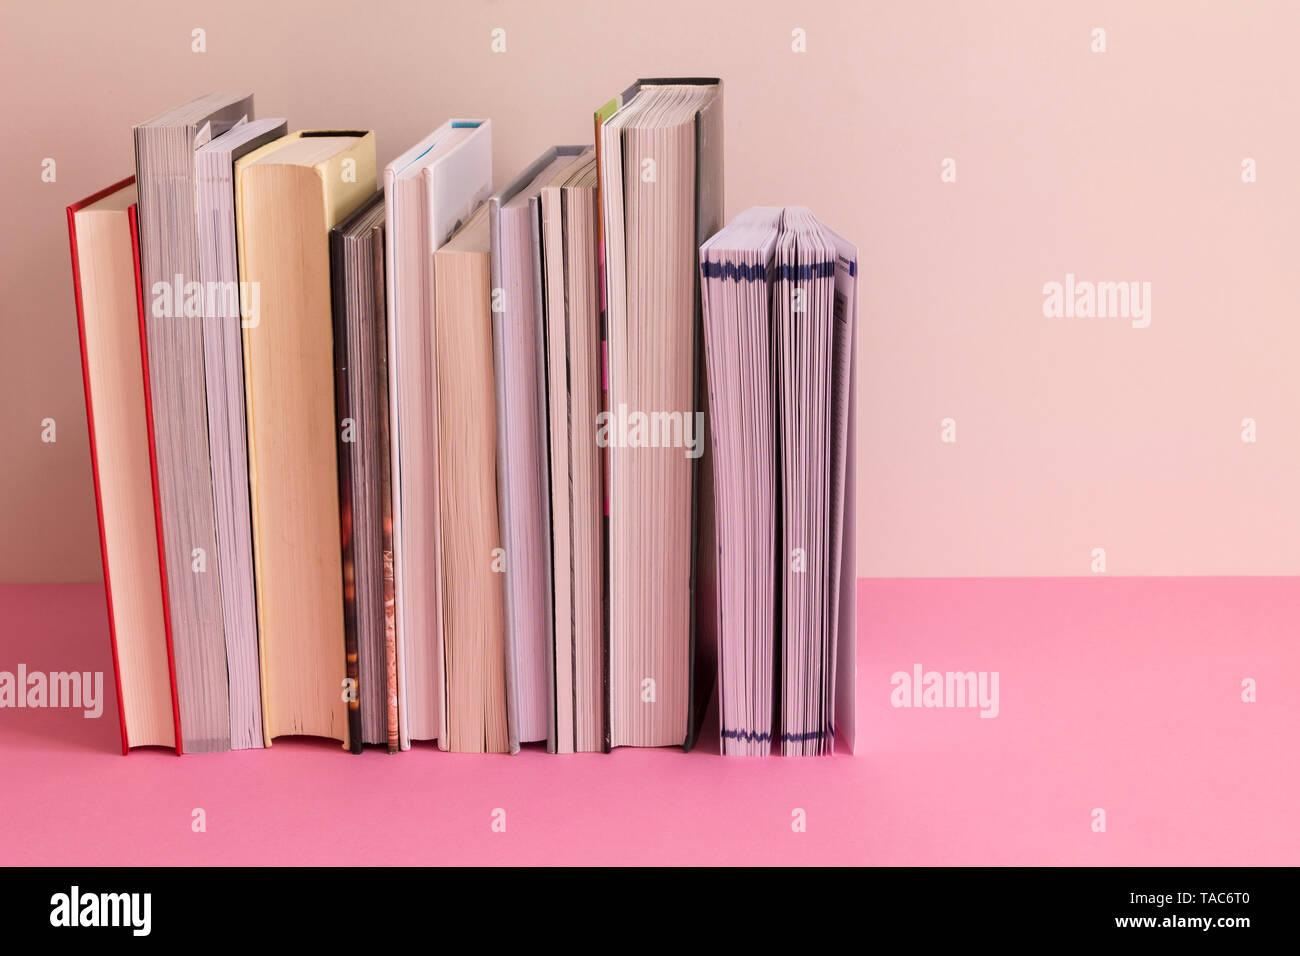 Row of books - Stock Image